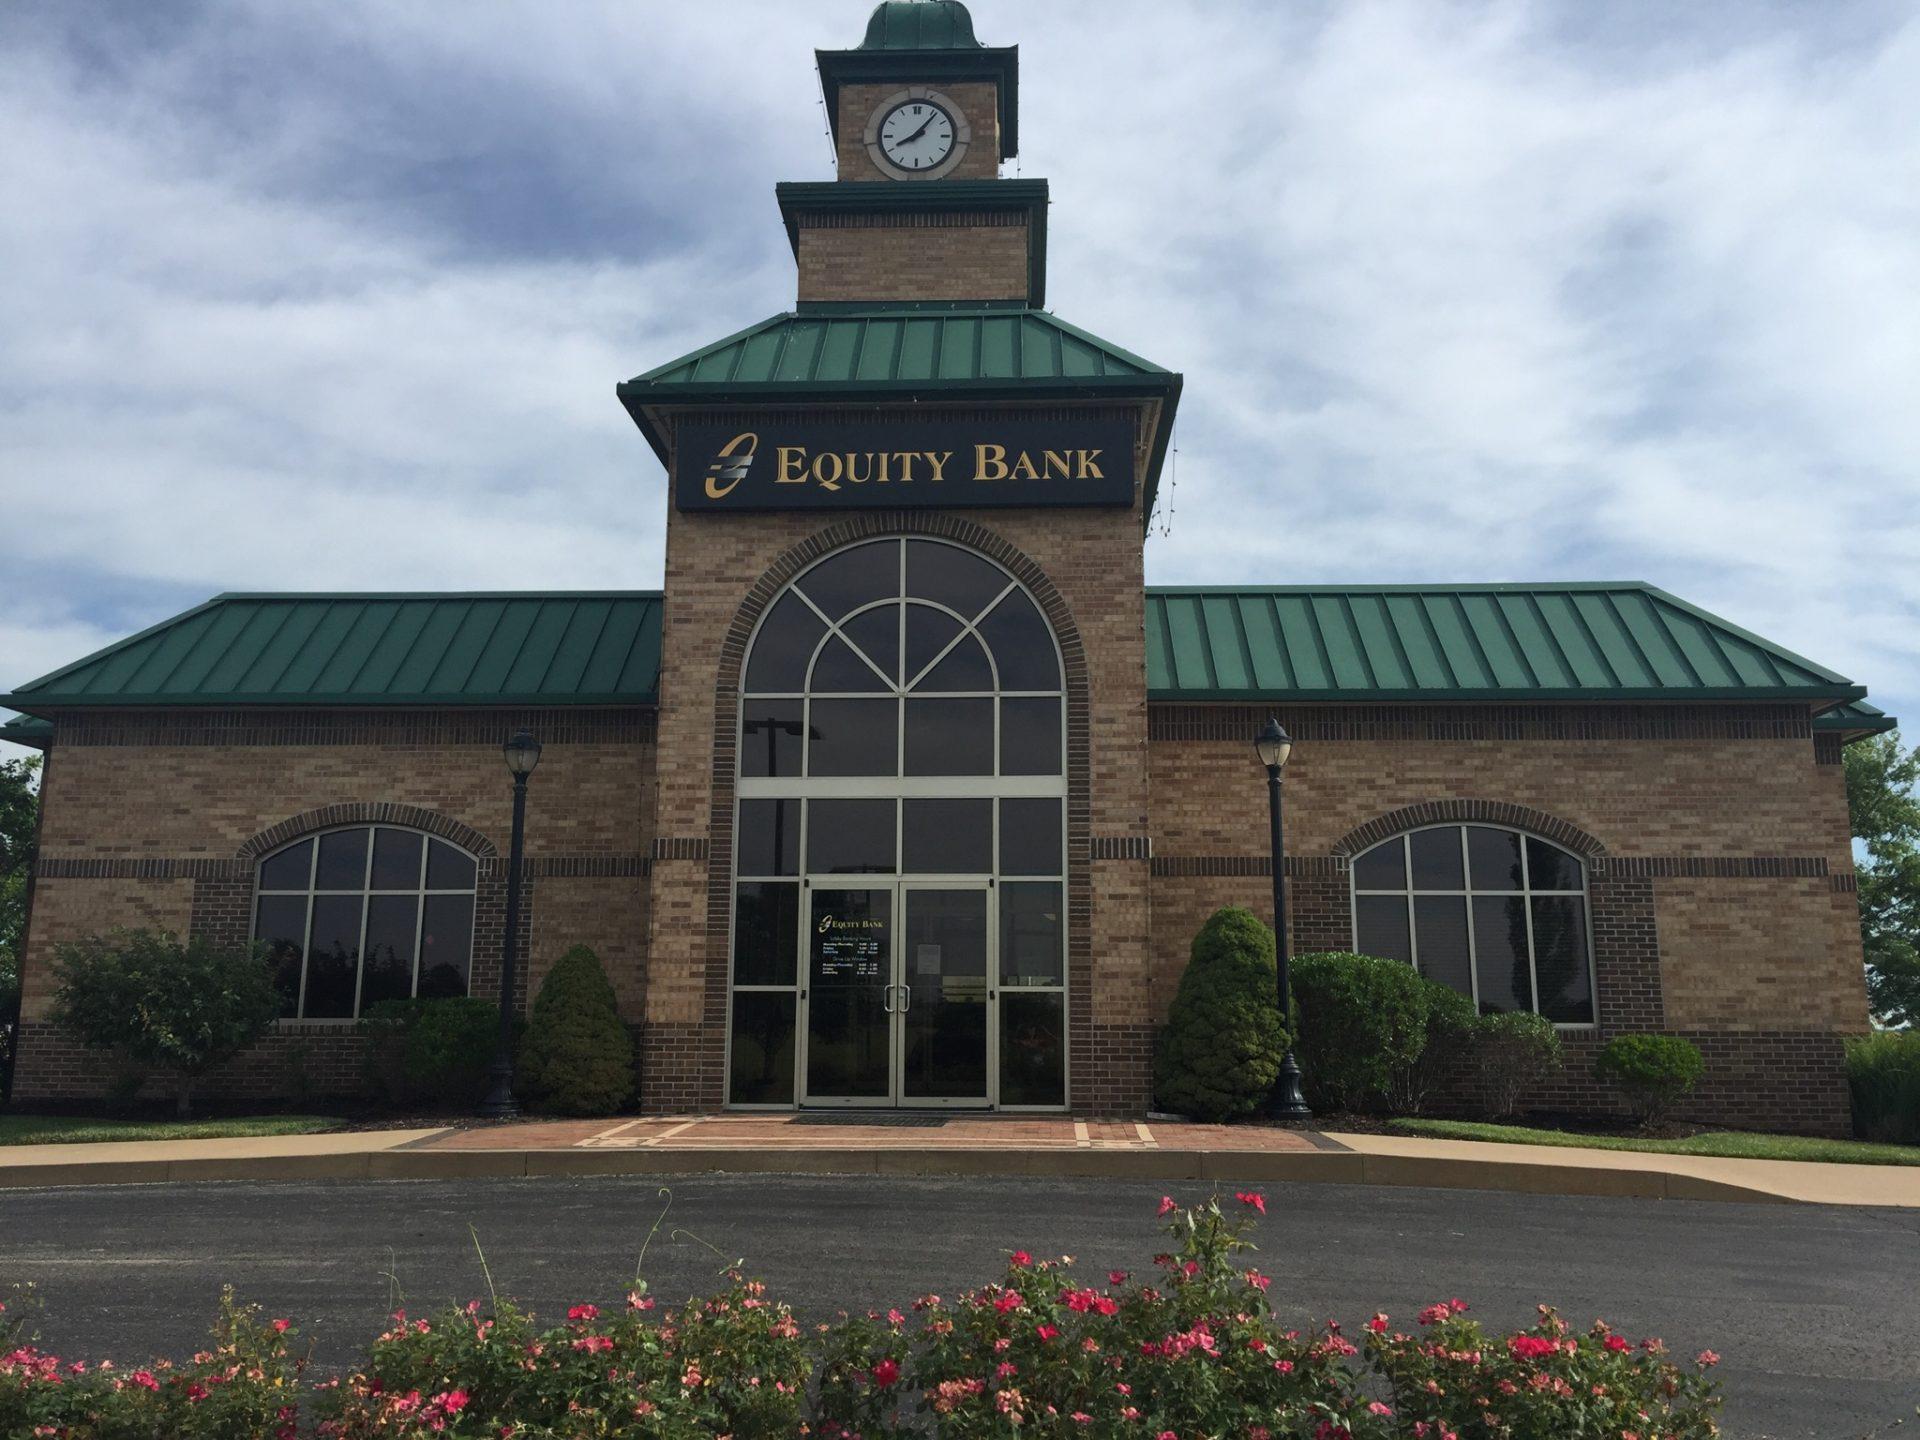 Equity Bank Higginsville branch exterior.